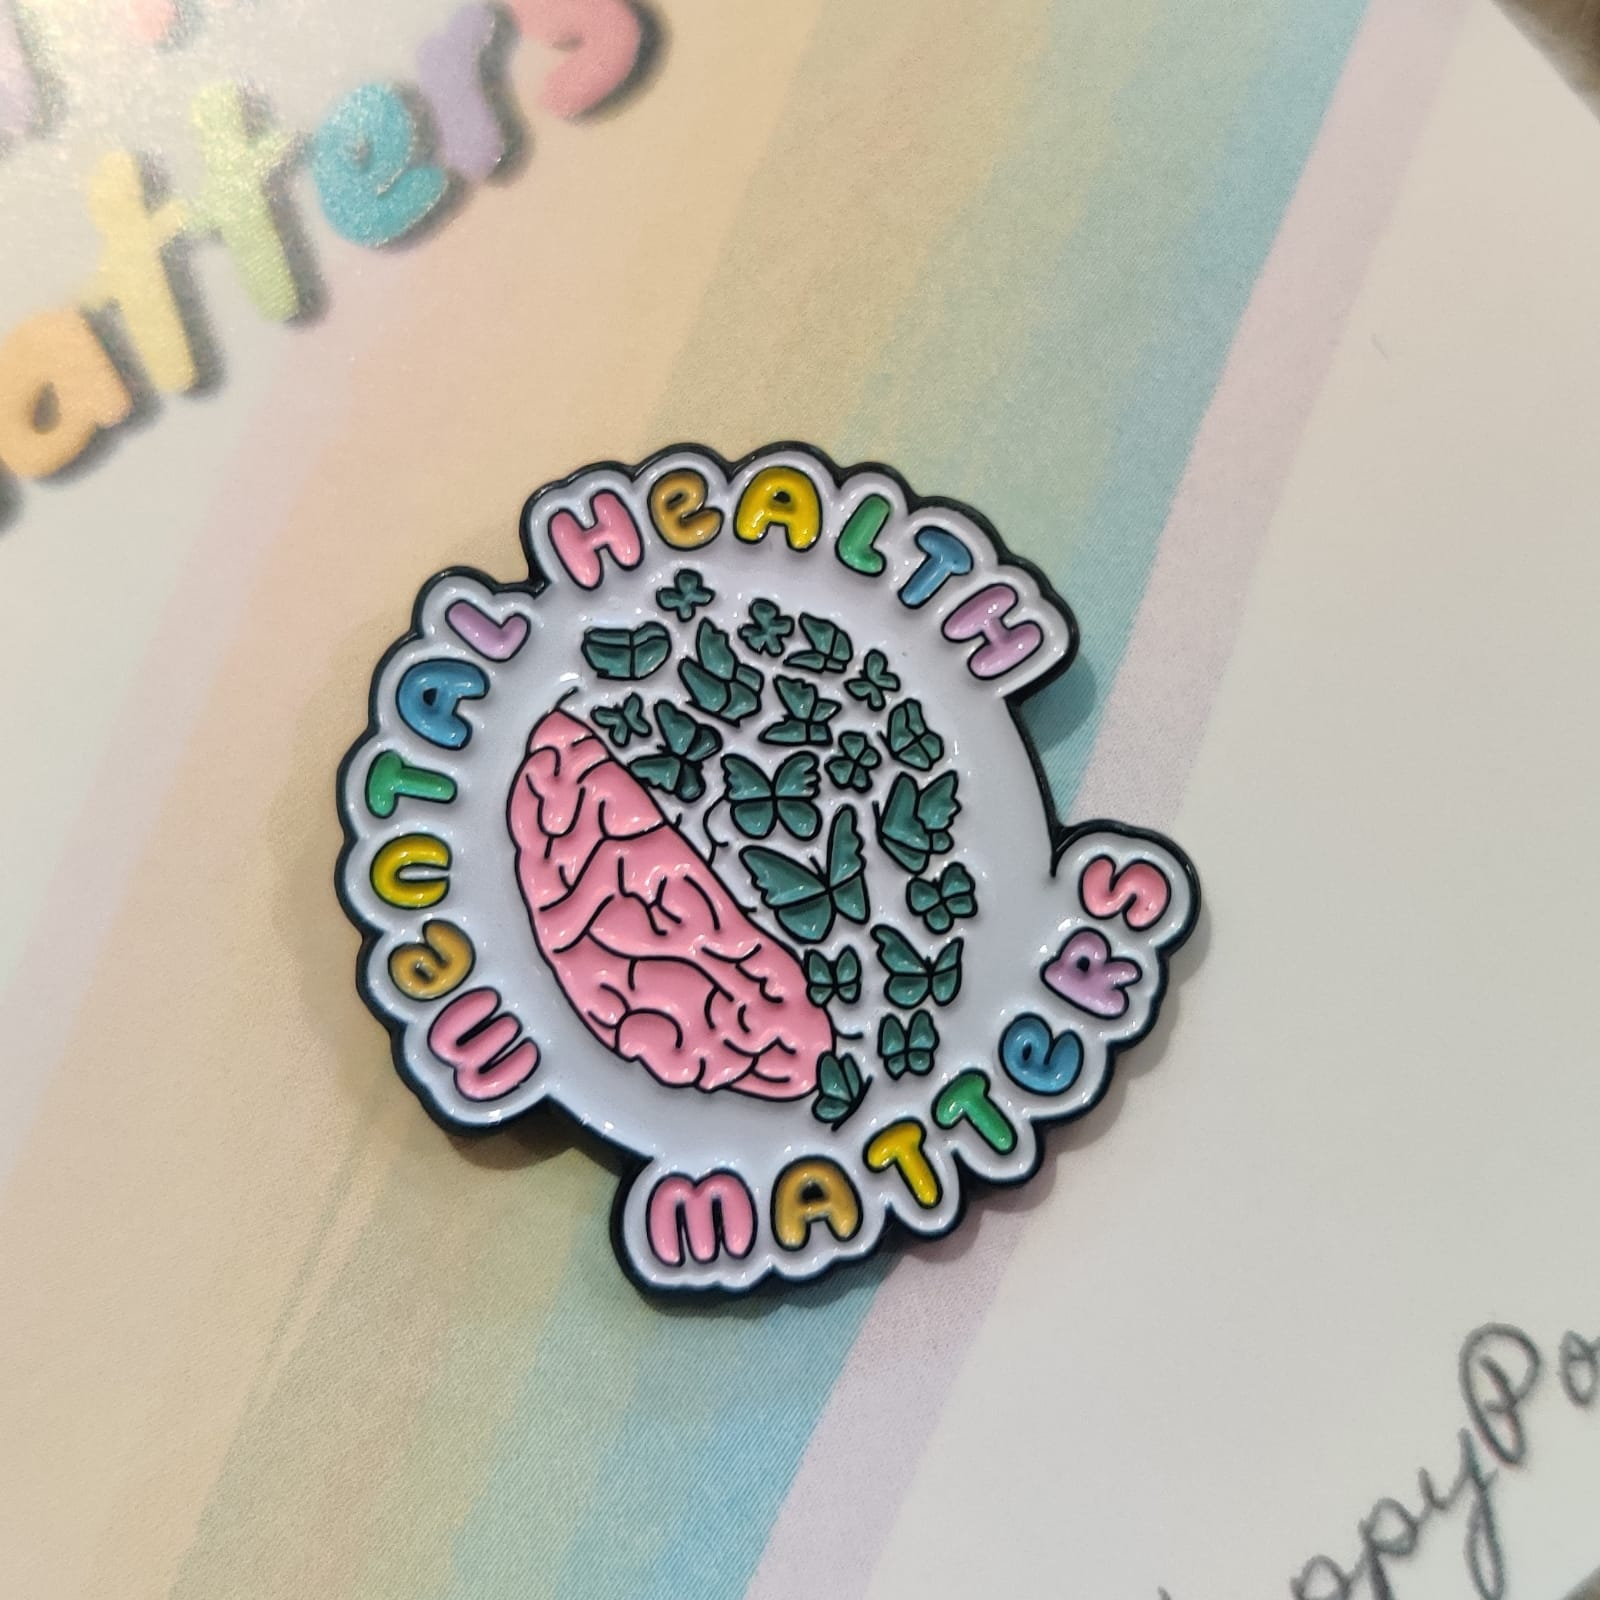 Mental Health Matters Enamel Pin Badge | Mental Health Support Pin | Mental Health is Important| Anxiety | Positivity Pin | Charity Donation Kind Shop 3